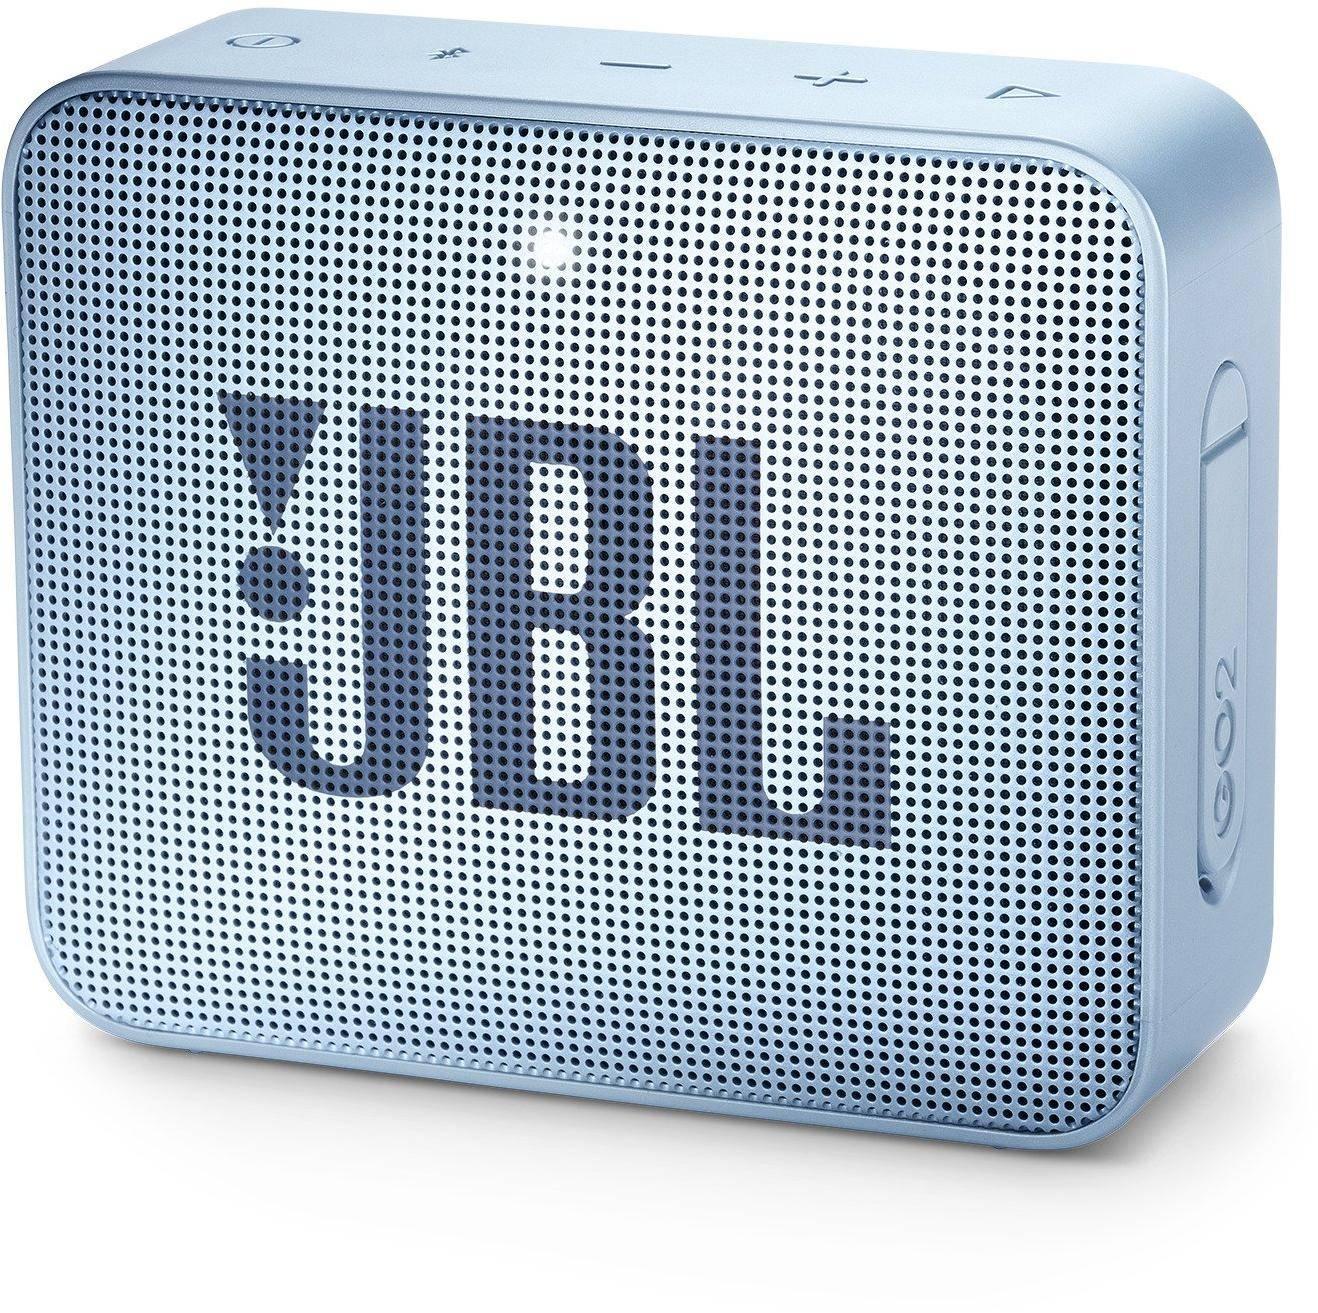 JBL GO 2 Portable Bluetooth Waterproof Speaker With Mic zoom image